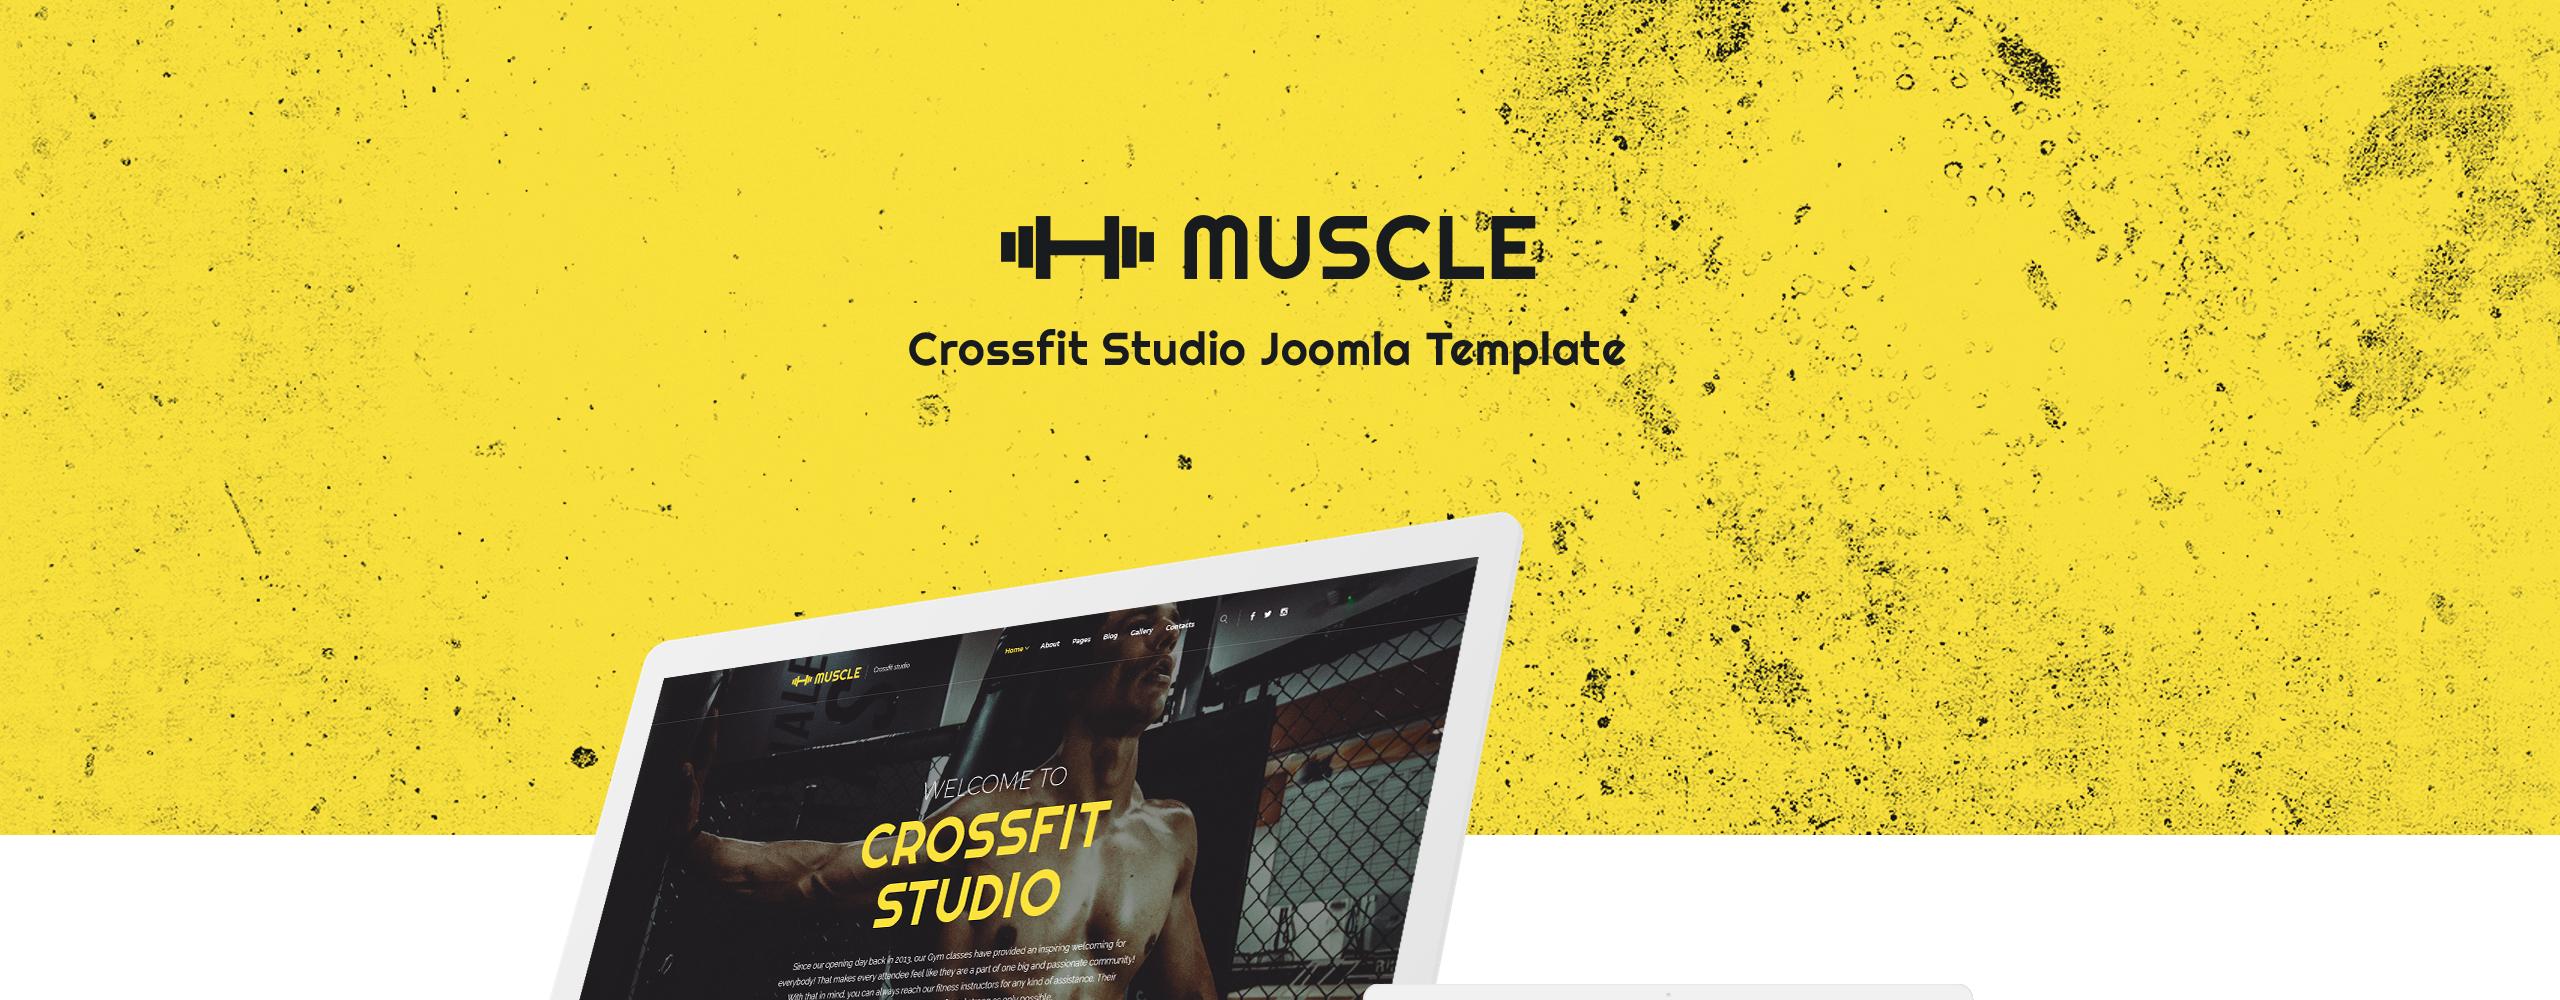 Website Design 69232 Gym Crossfit Sport Custom Basketball Football Golf Soccer Tennis Template Personal Studio Workout Bike Coaching